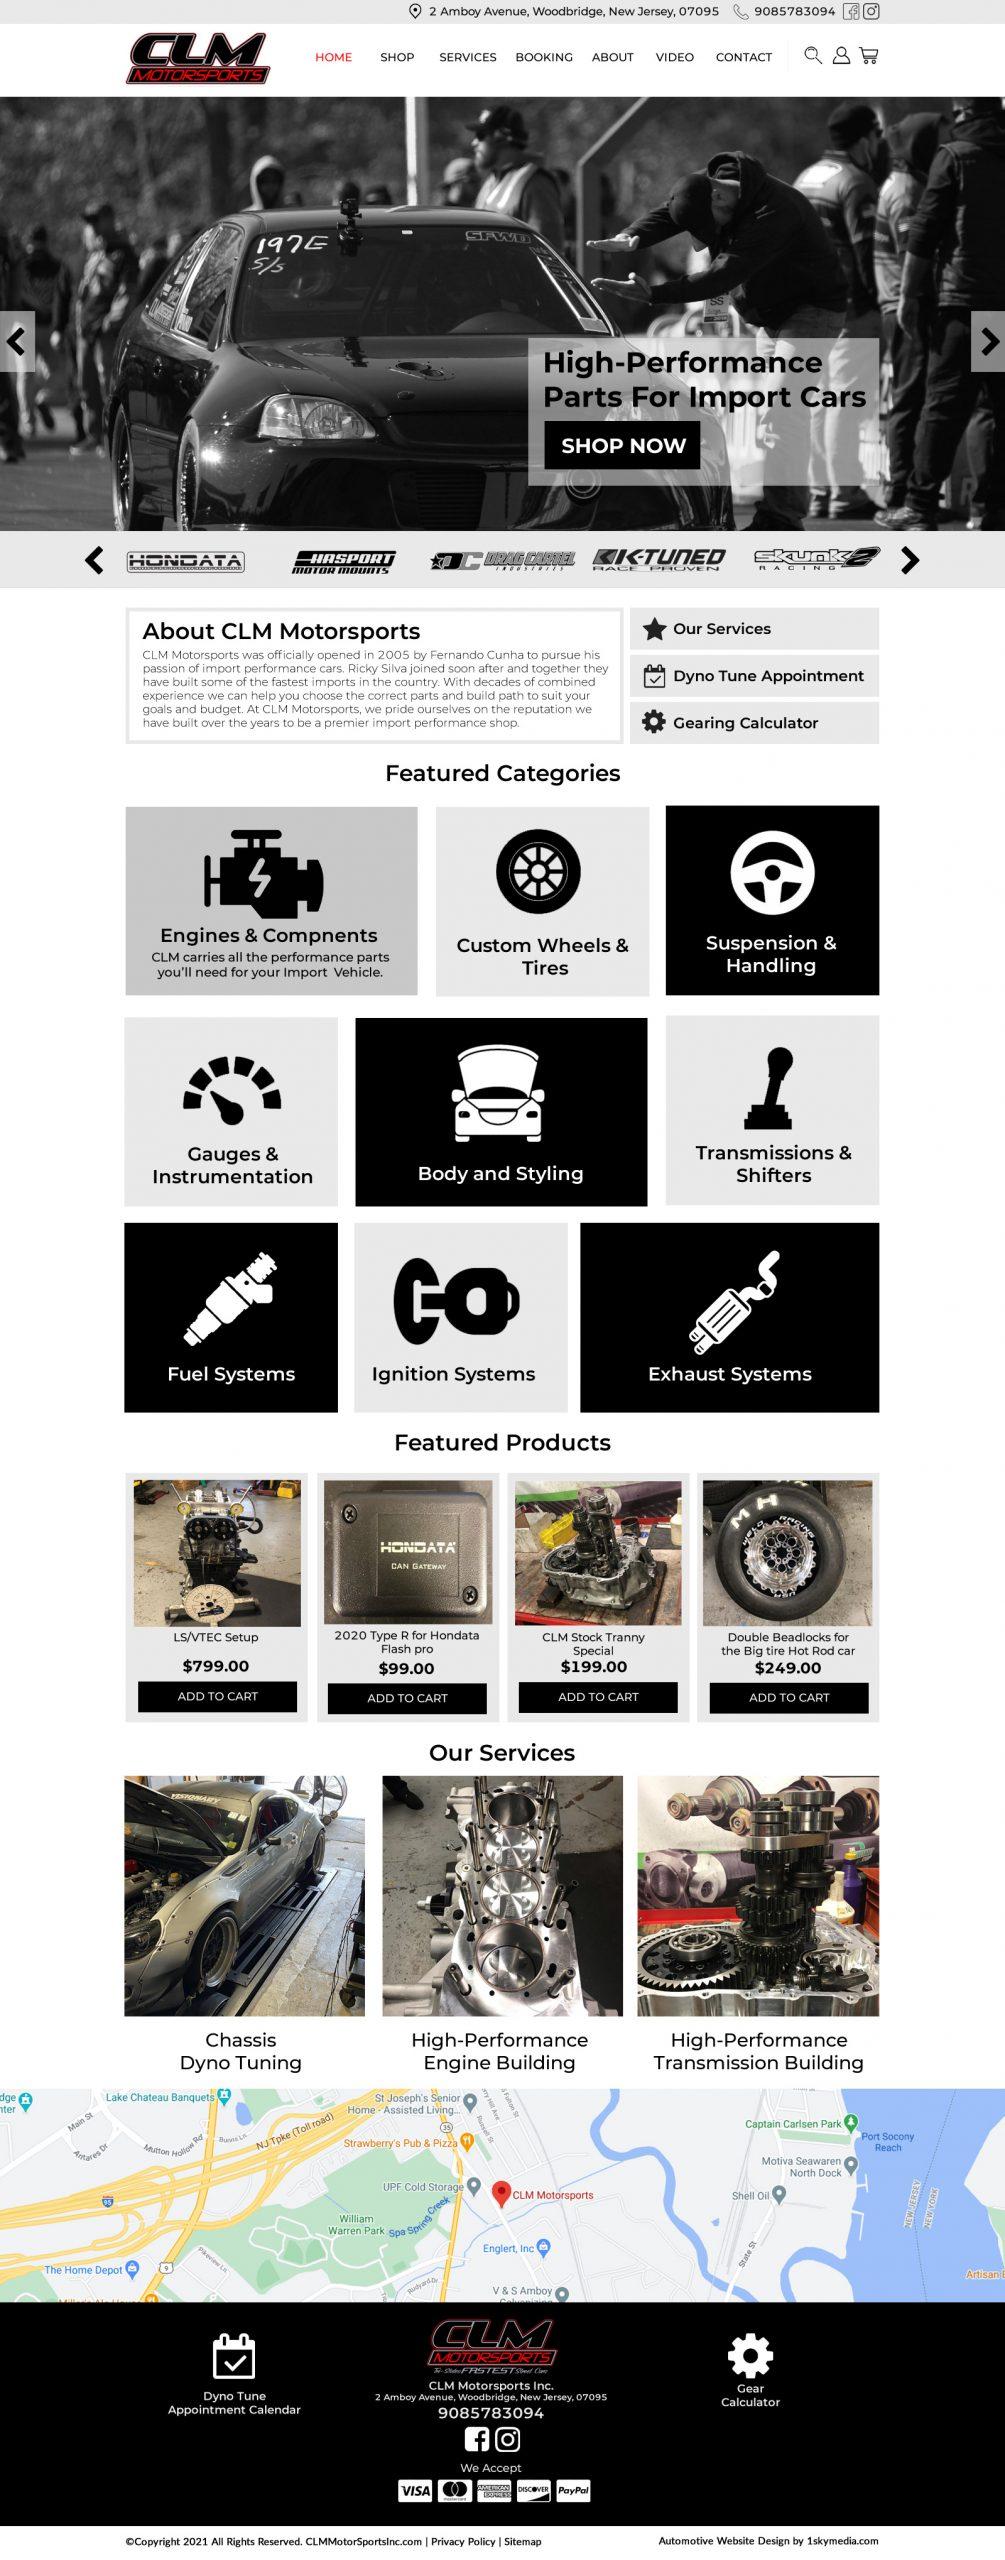 CLM MotorSports Website Design